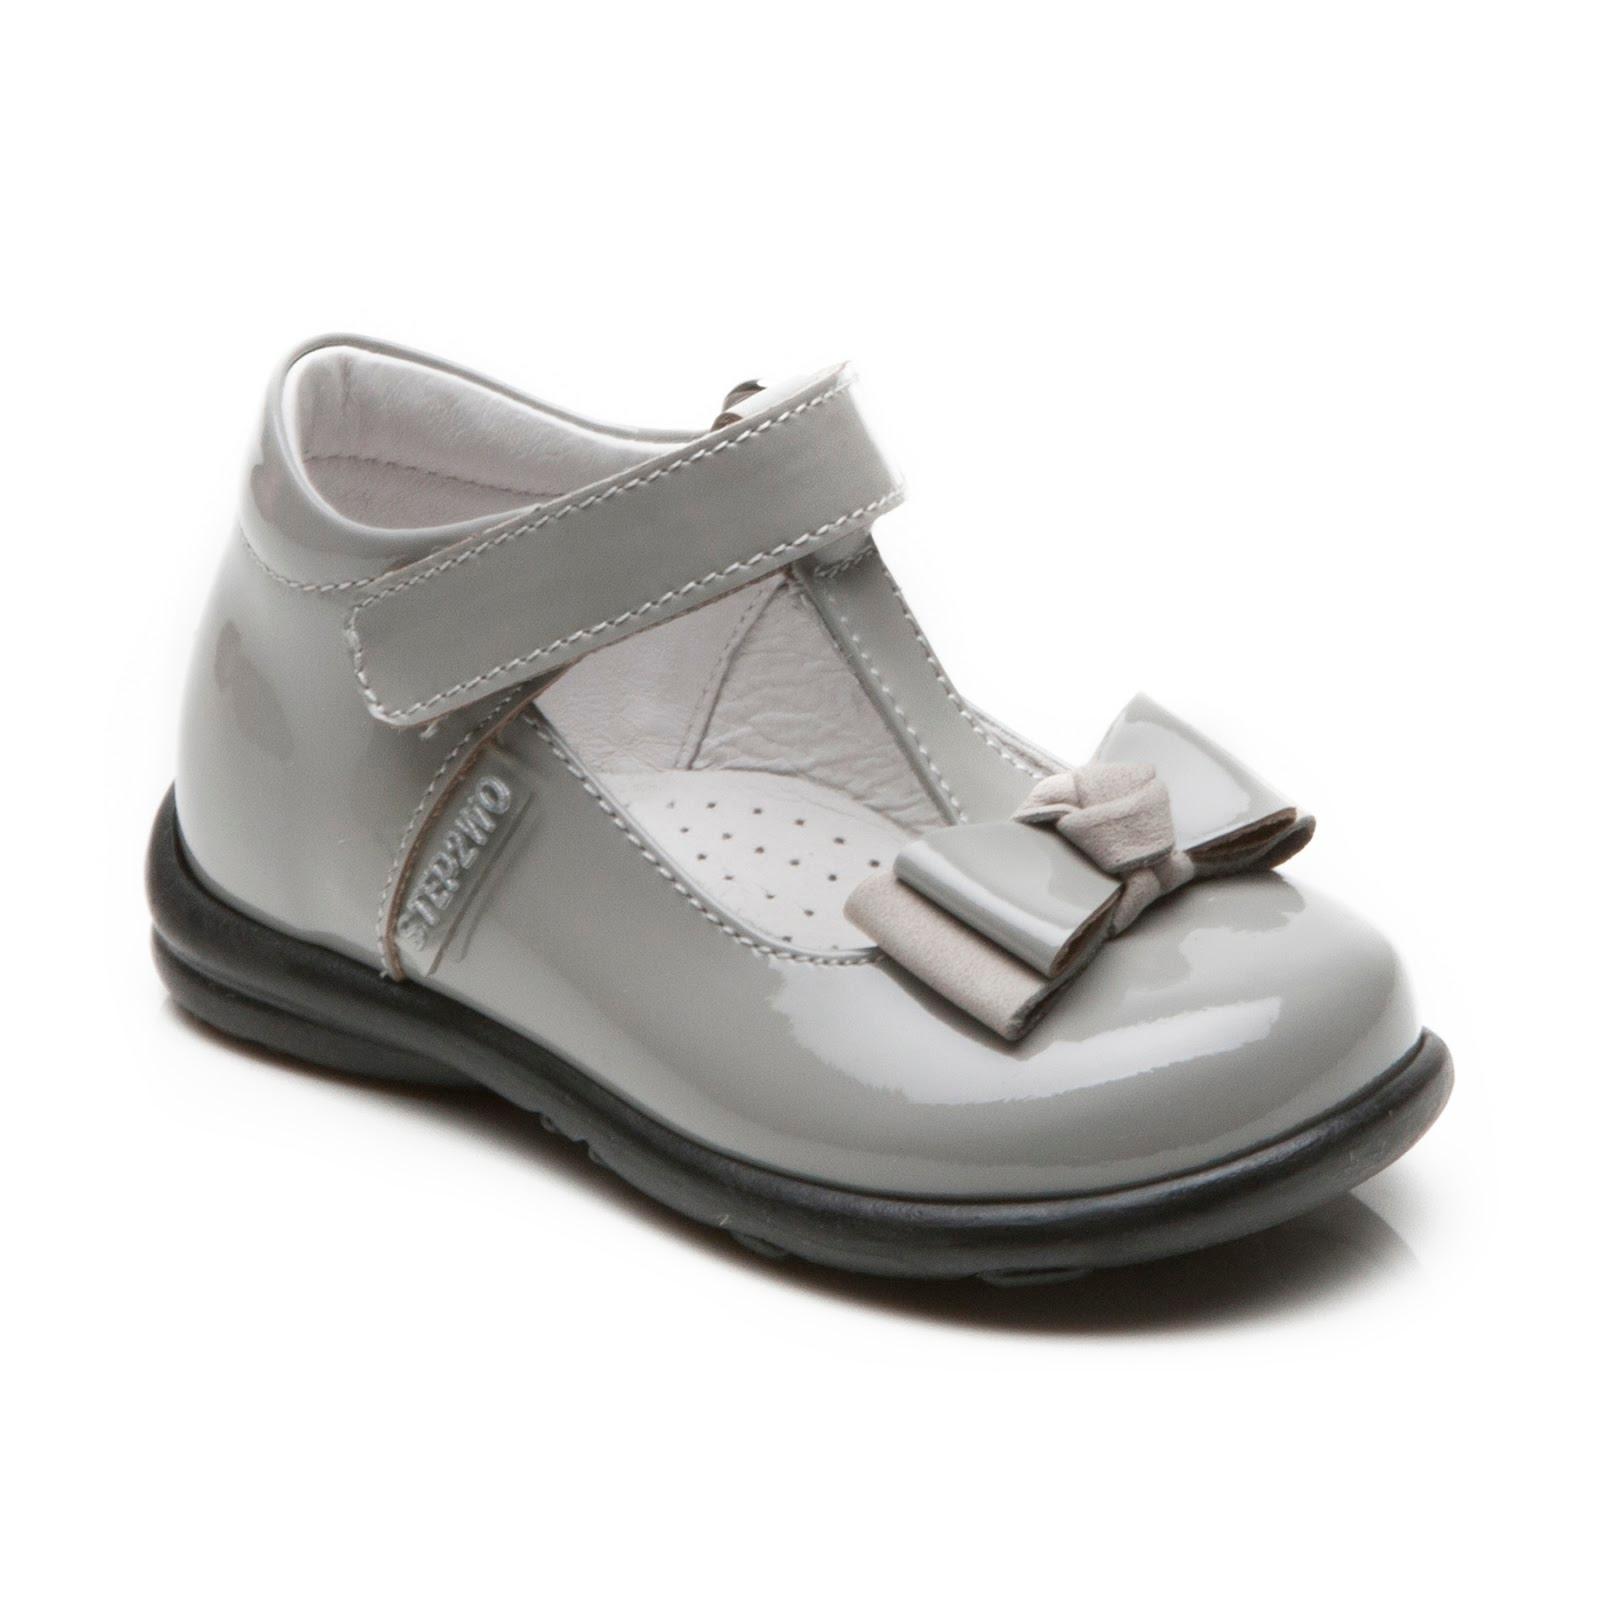 Designer Shoes Baby Trainers SandalsBootiesamp; Harvey Nichols hQstdCrx